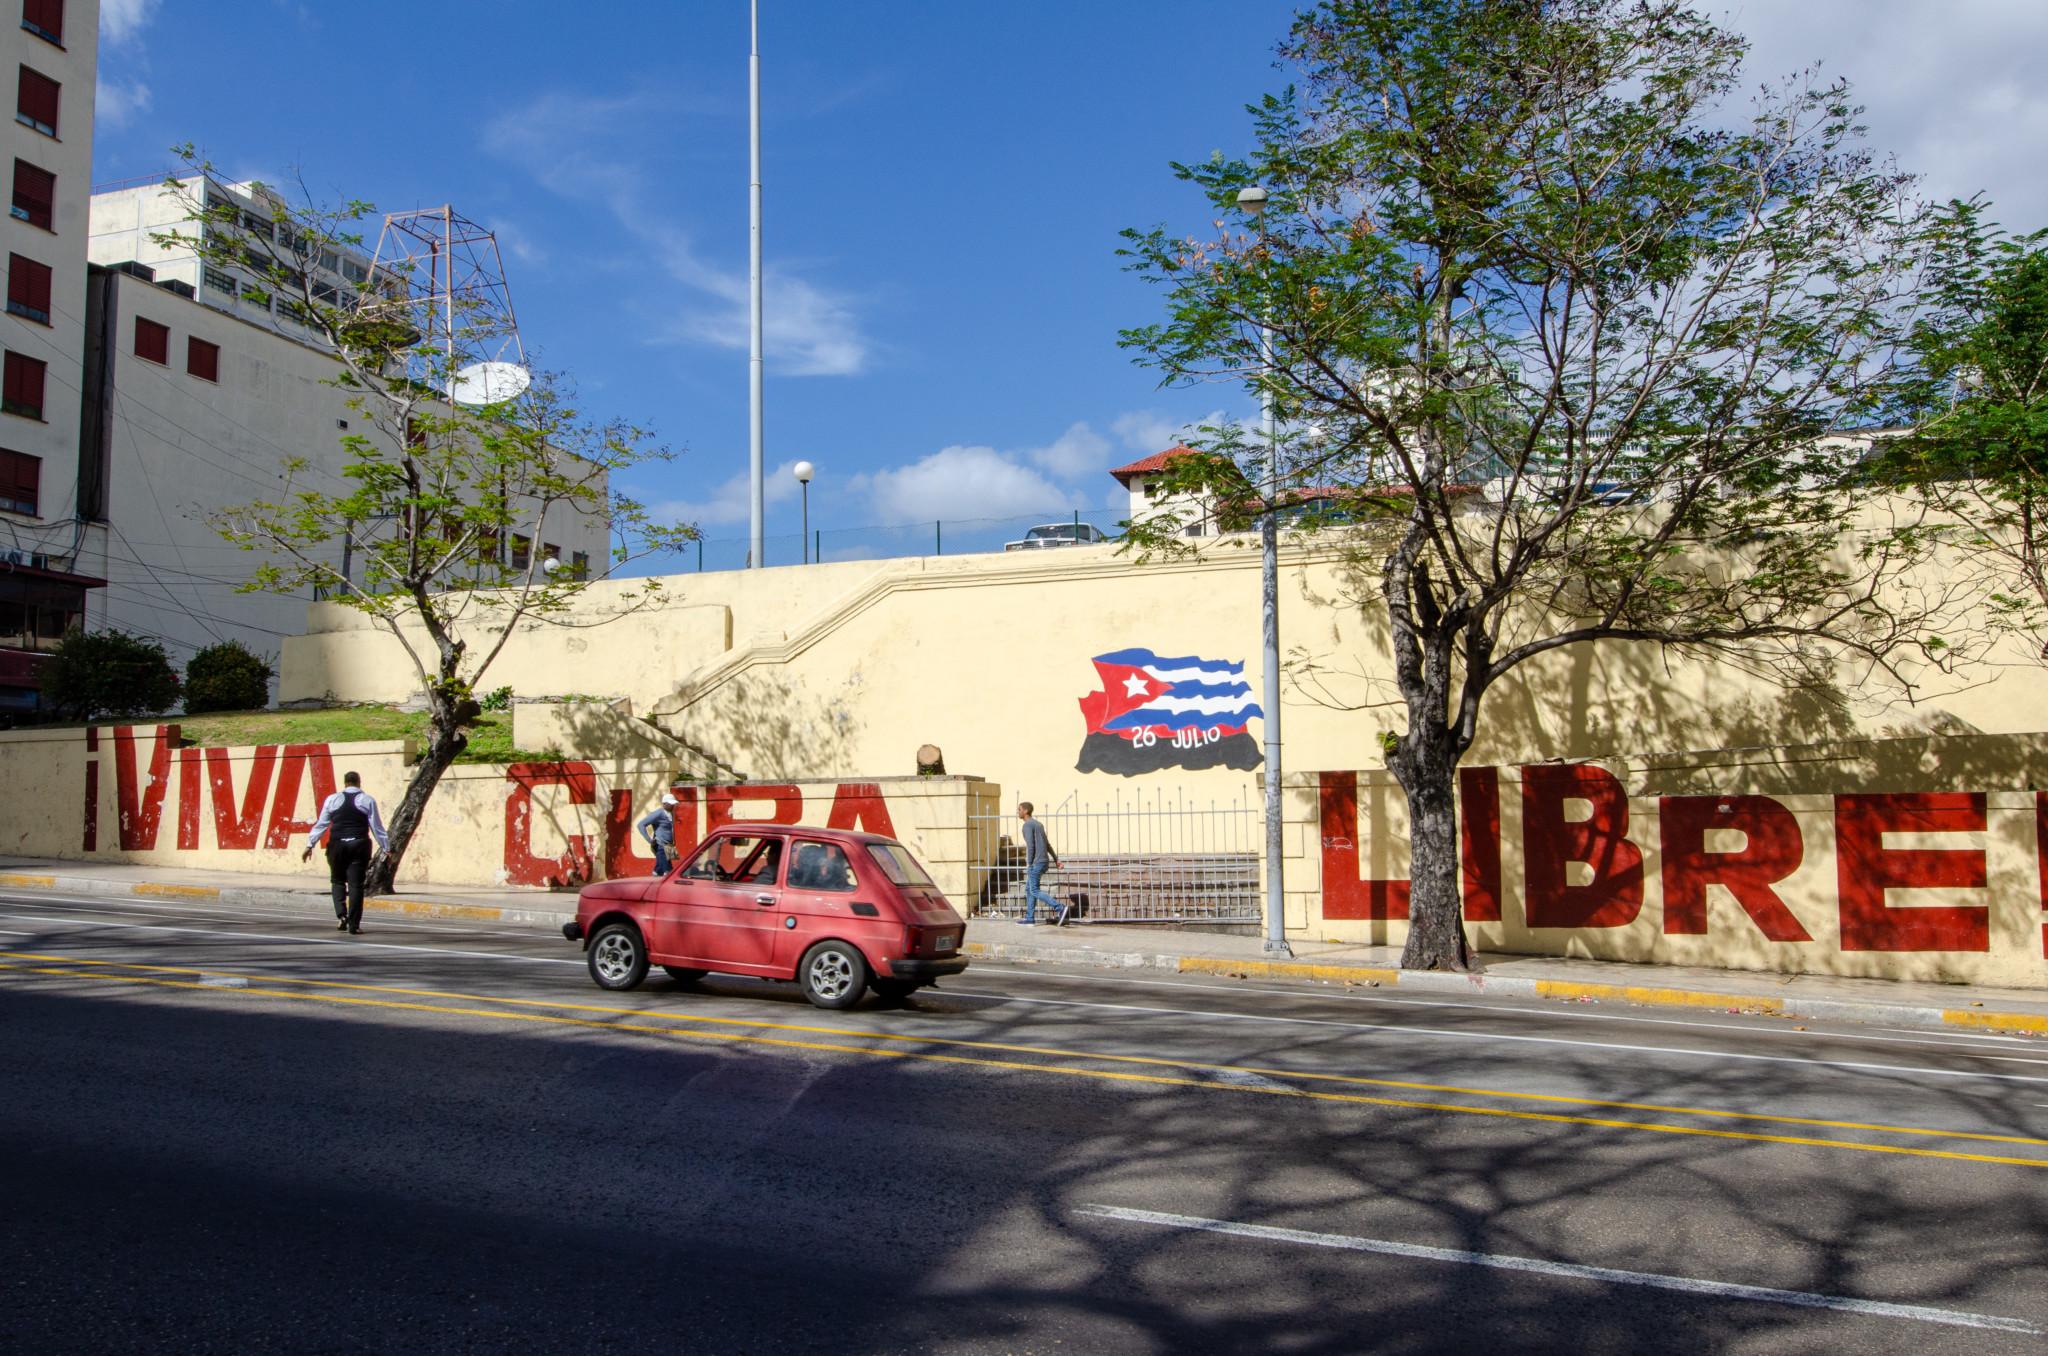 Gibt es in Kuba Internet? So gehst du in Kuba online